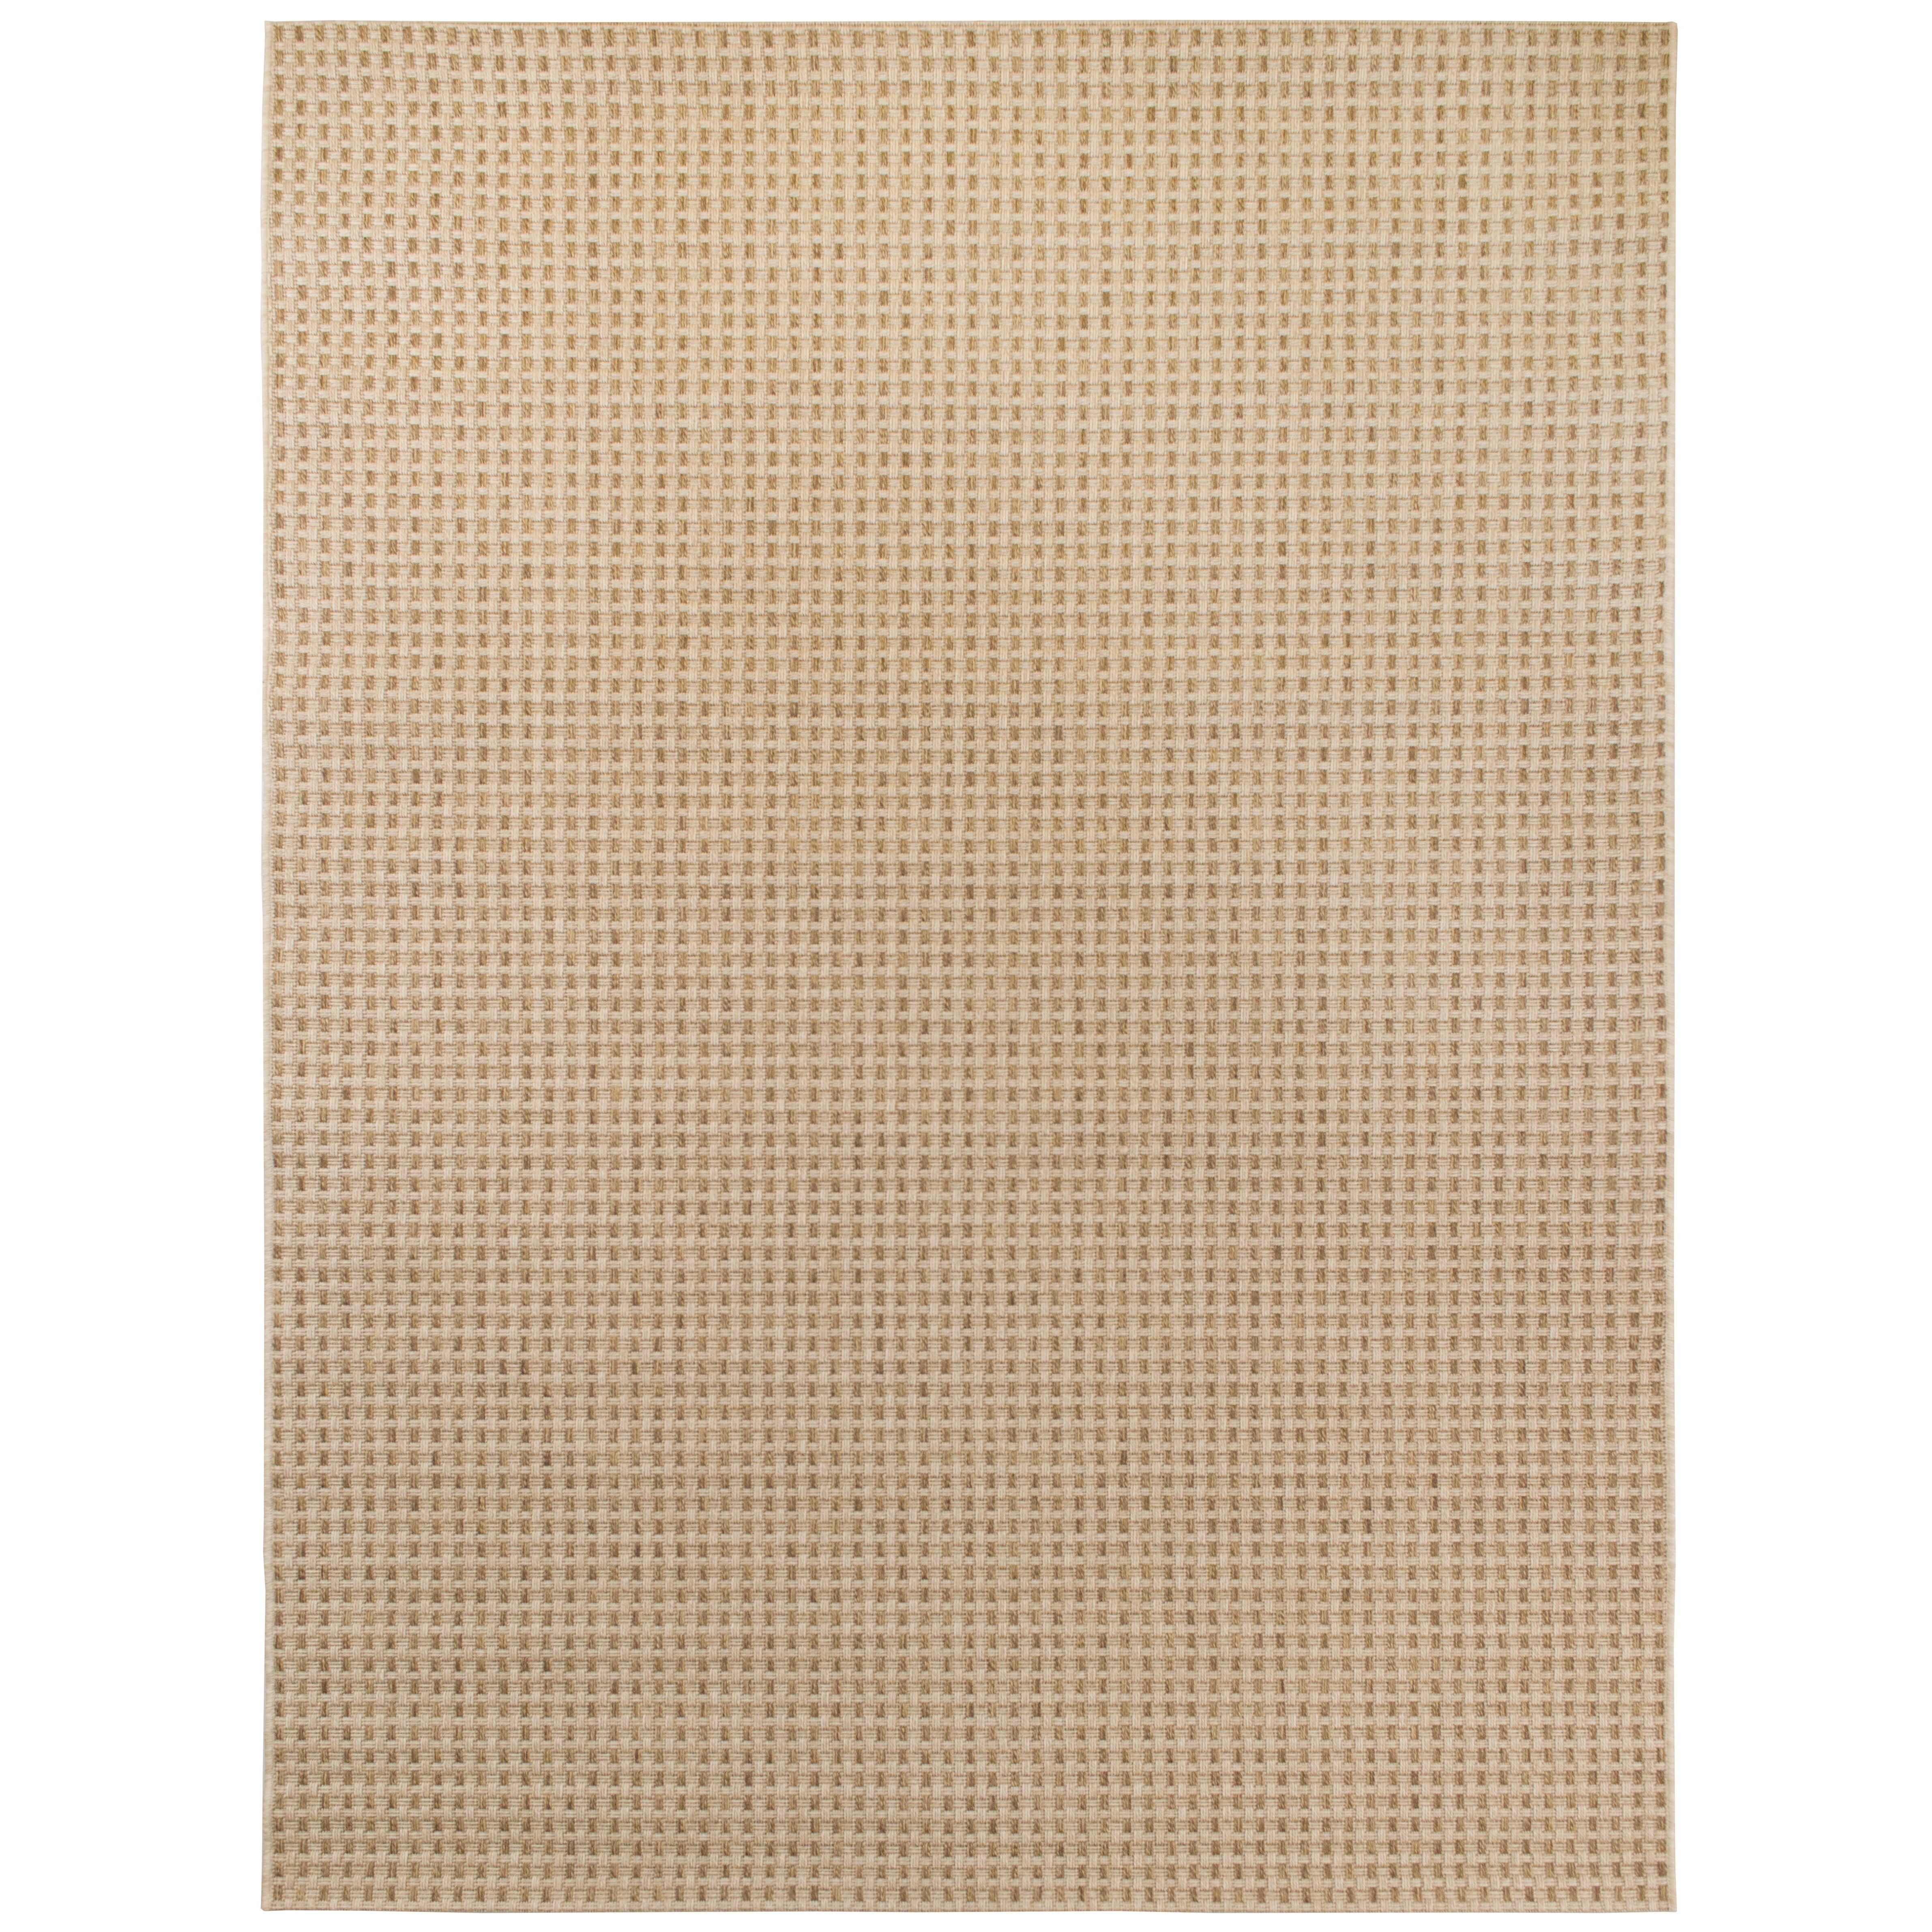 Balta carlisle beige indoor outdoor area rug reviews for 10x10 area rug